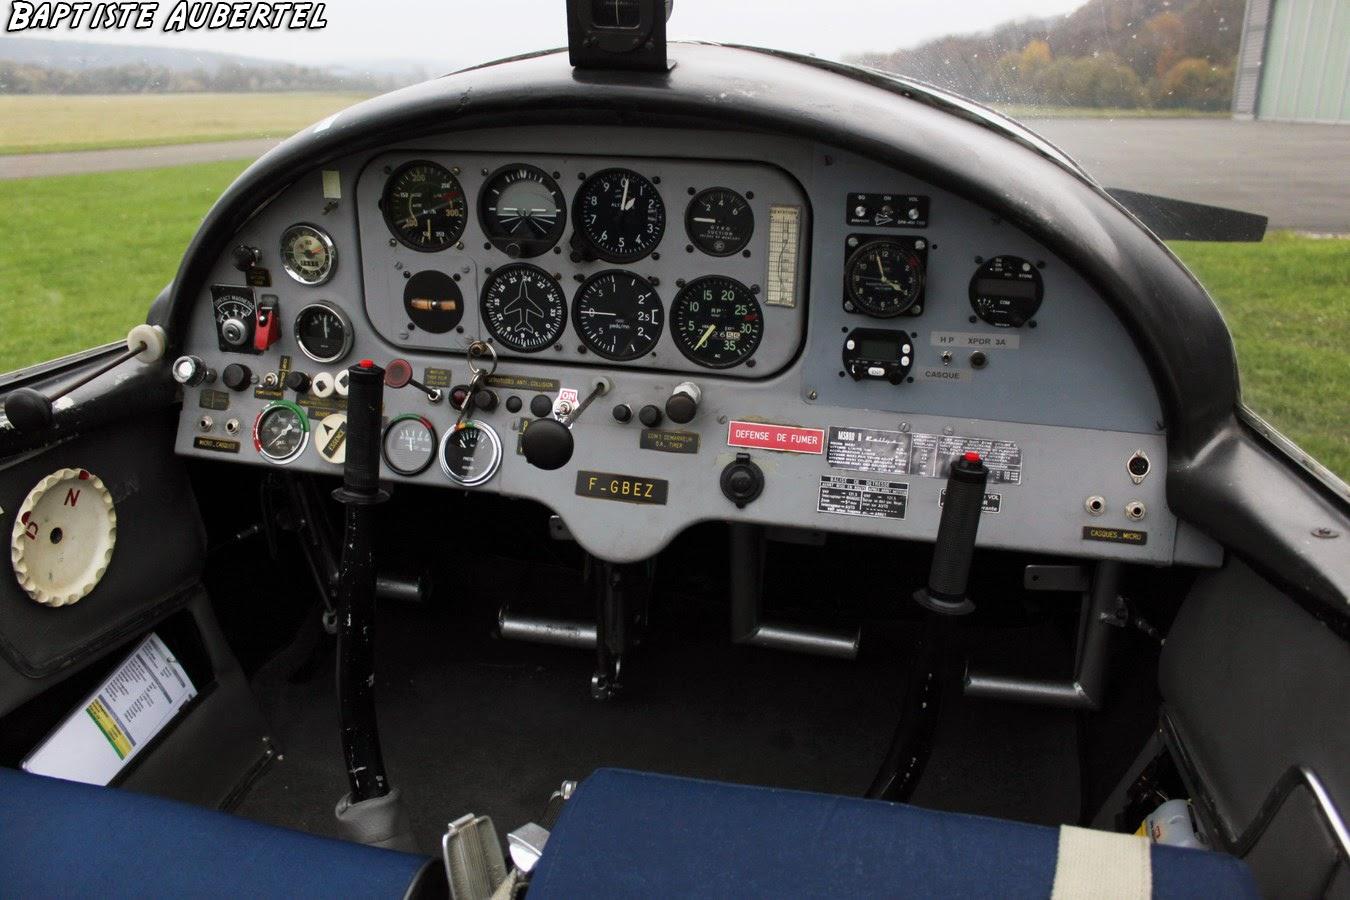 Socata Rallye MS 880 B Cockpit